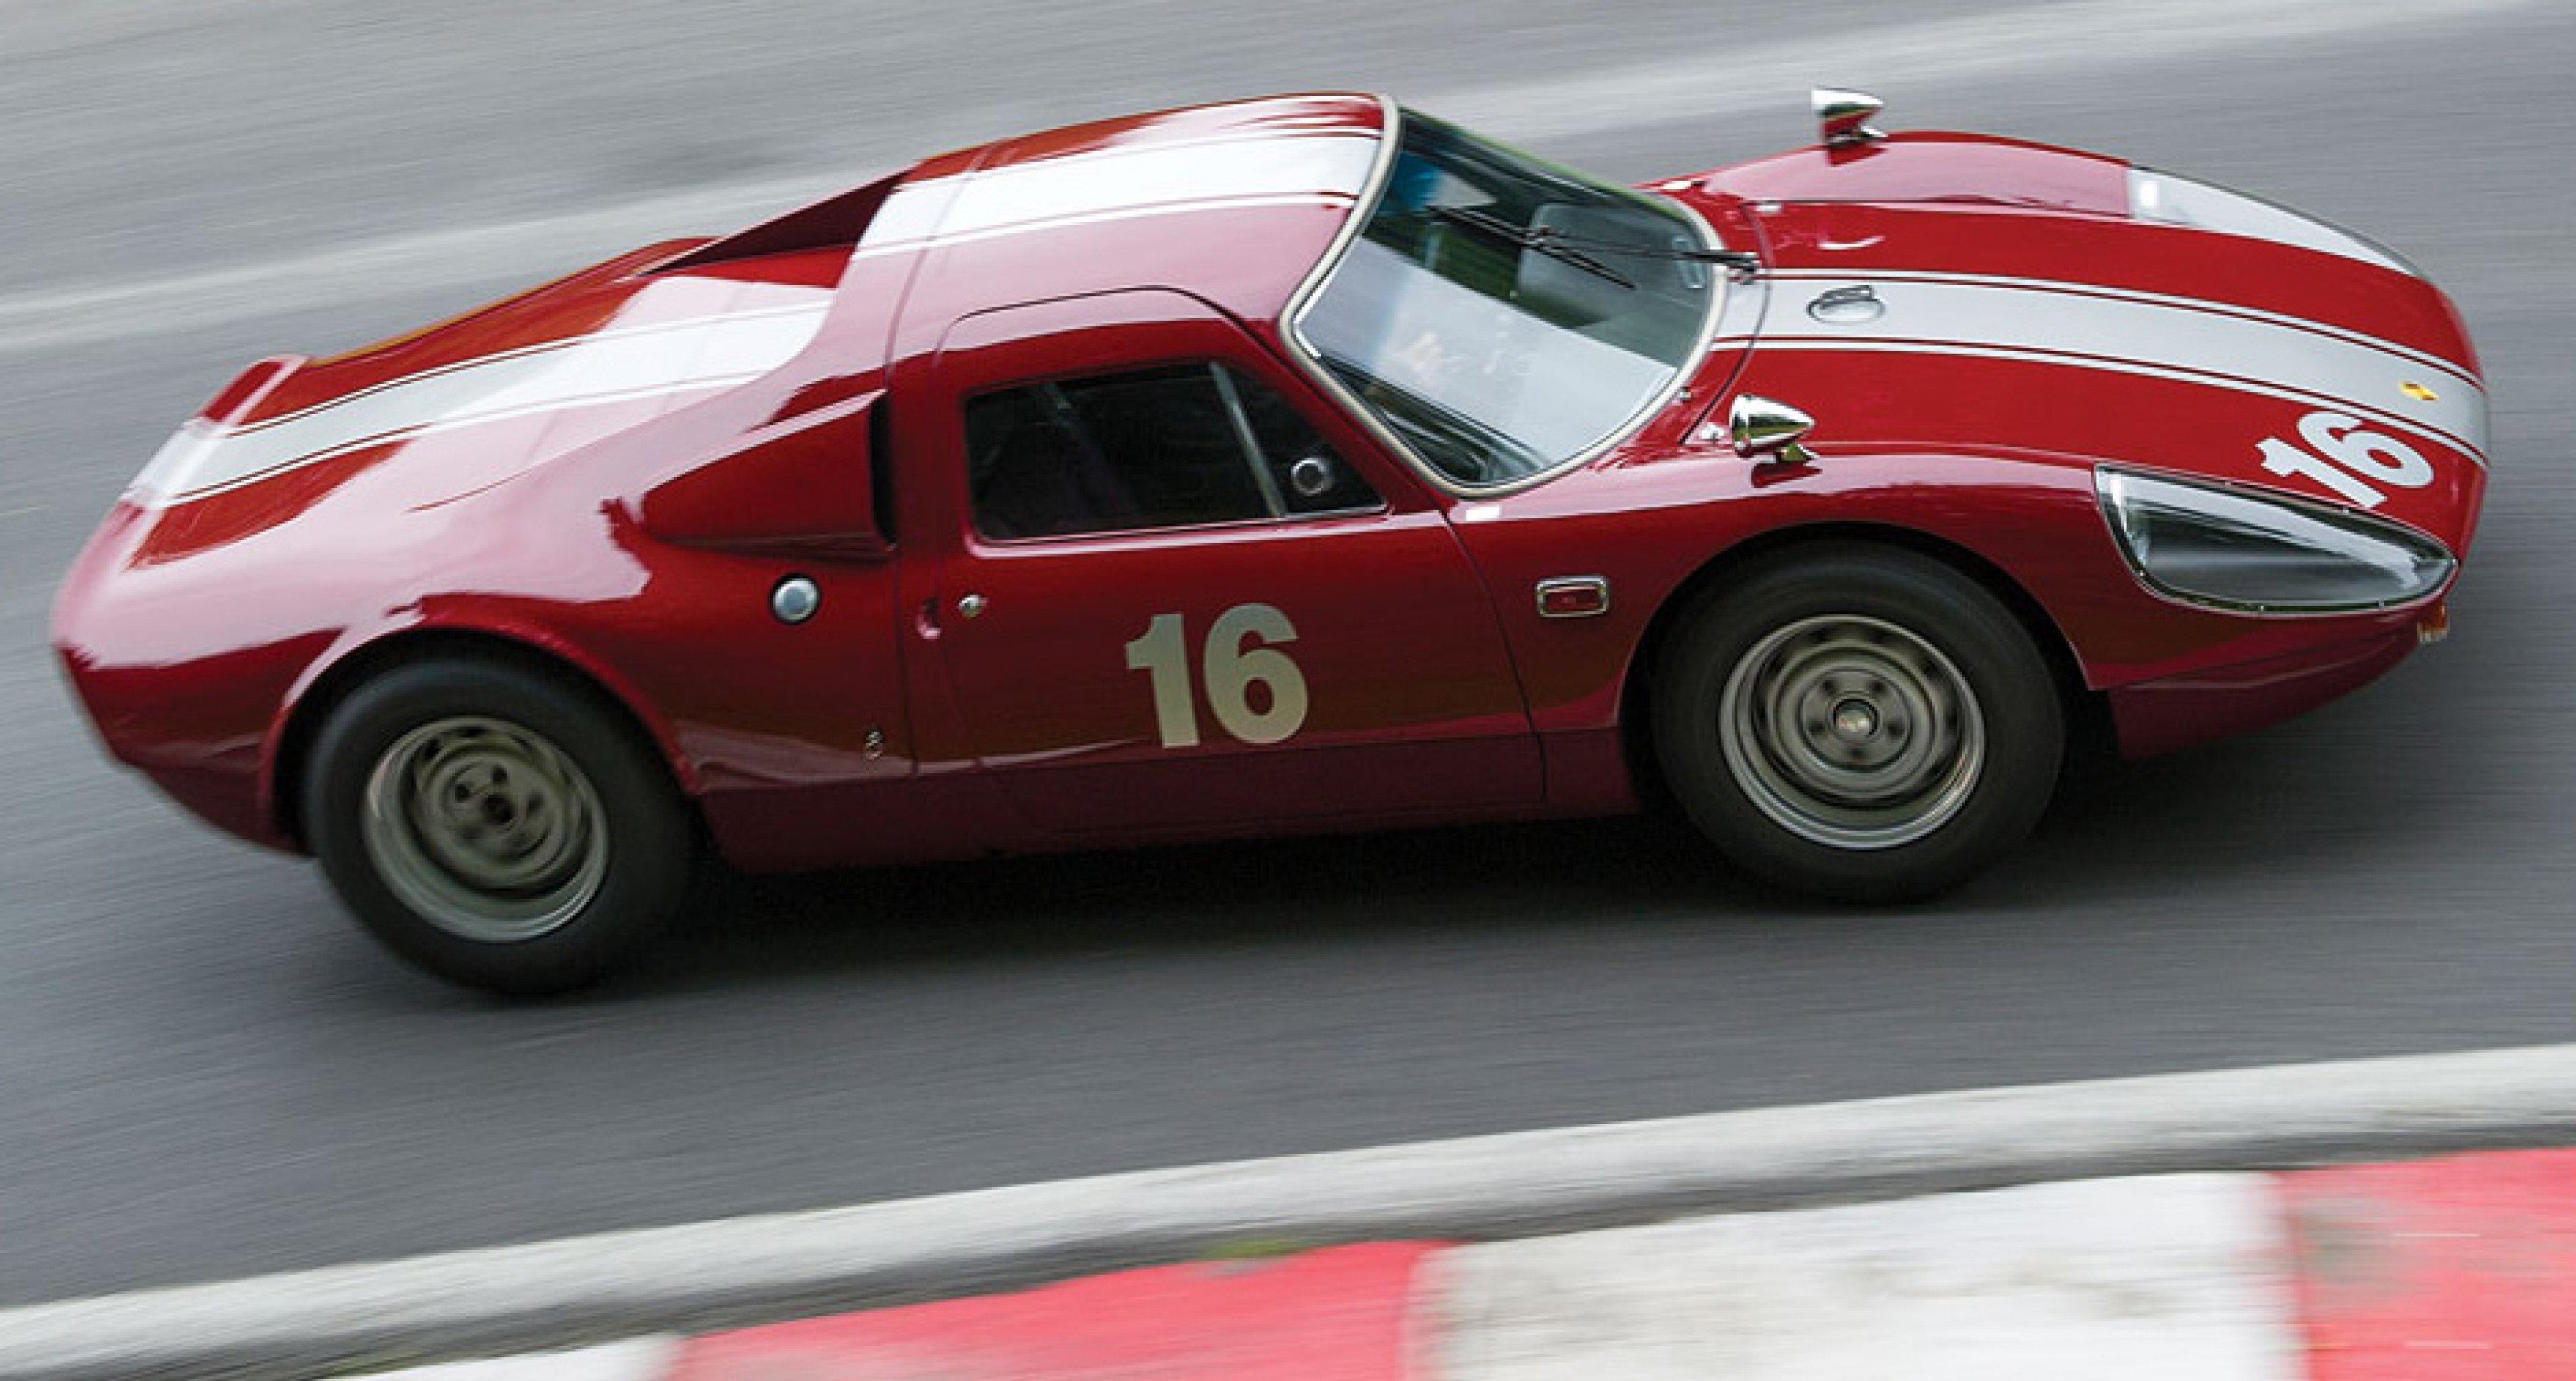 1965 Porsche 904/6 Carrera GTS